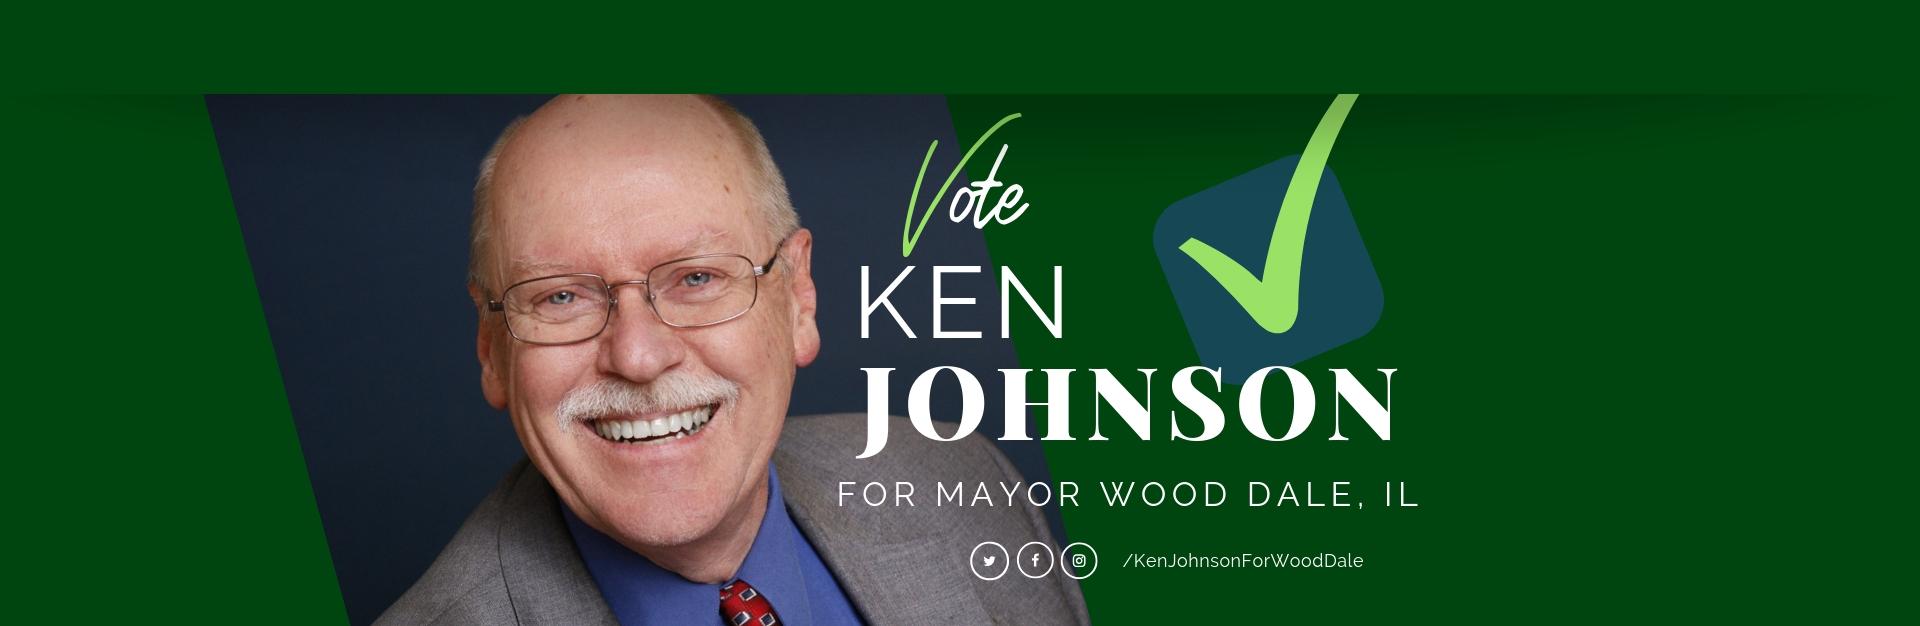 Kenneth-P-Johnson-for-Mayor-Wood-Dale-ILLINOIS-1.jpg